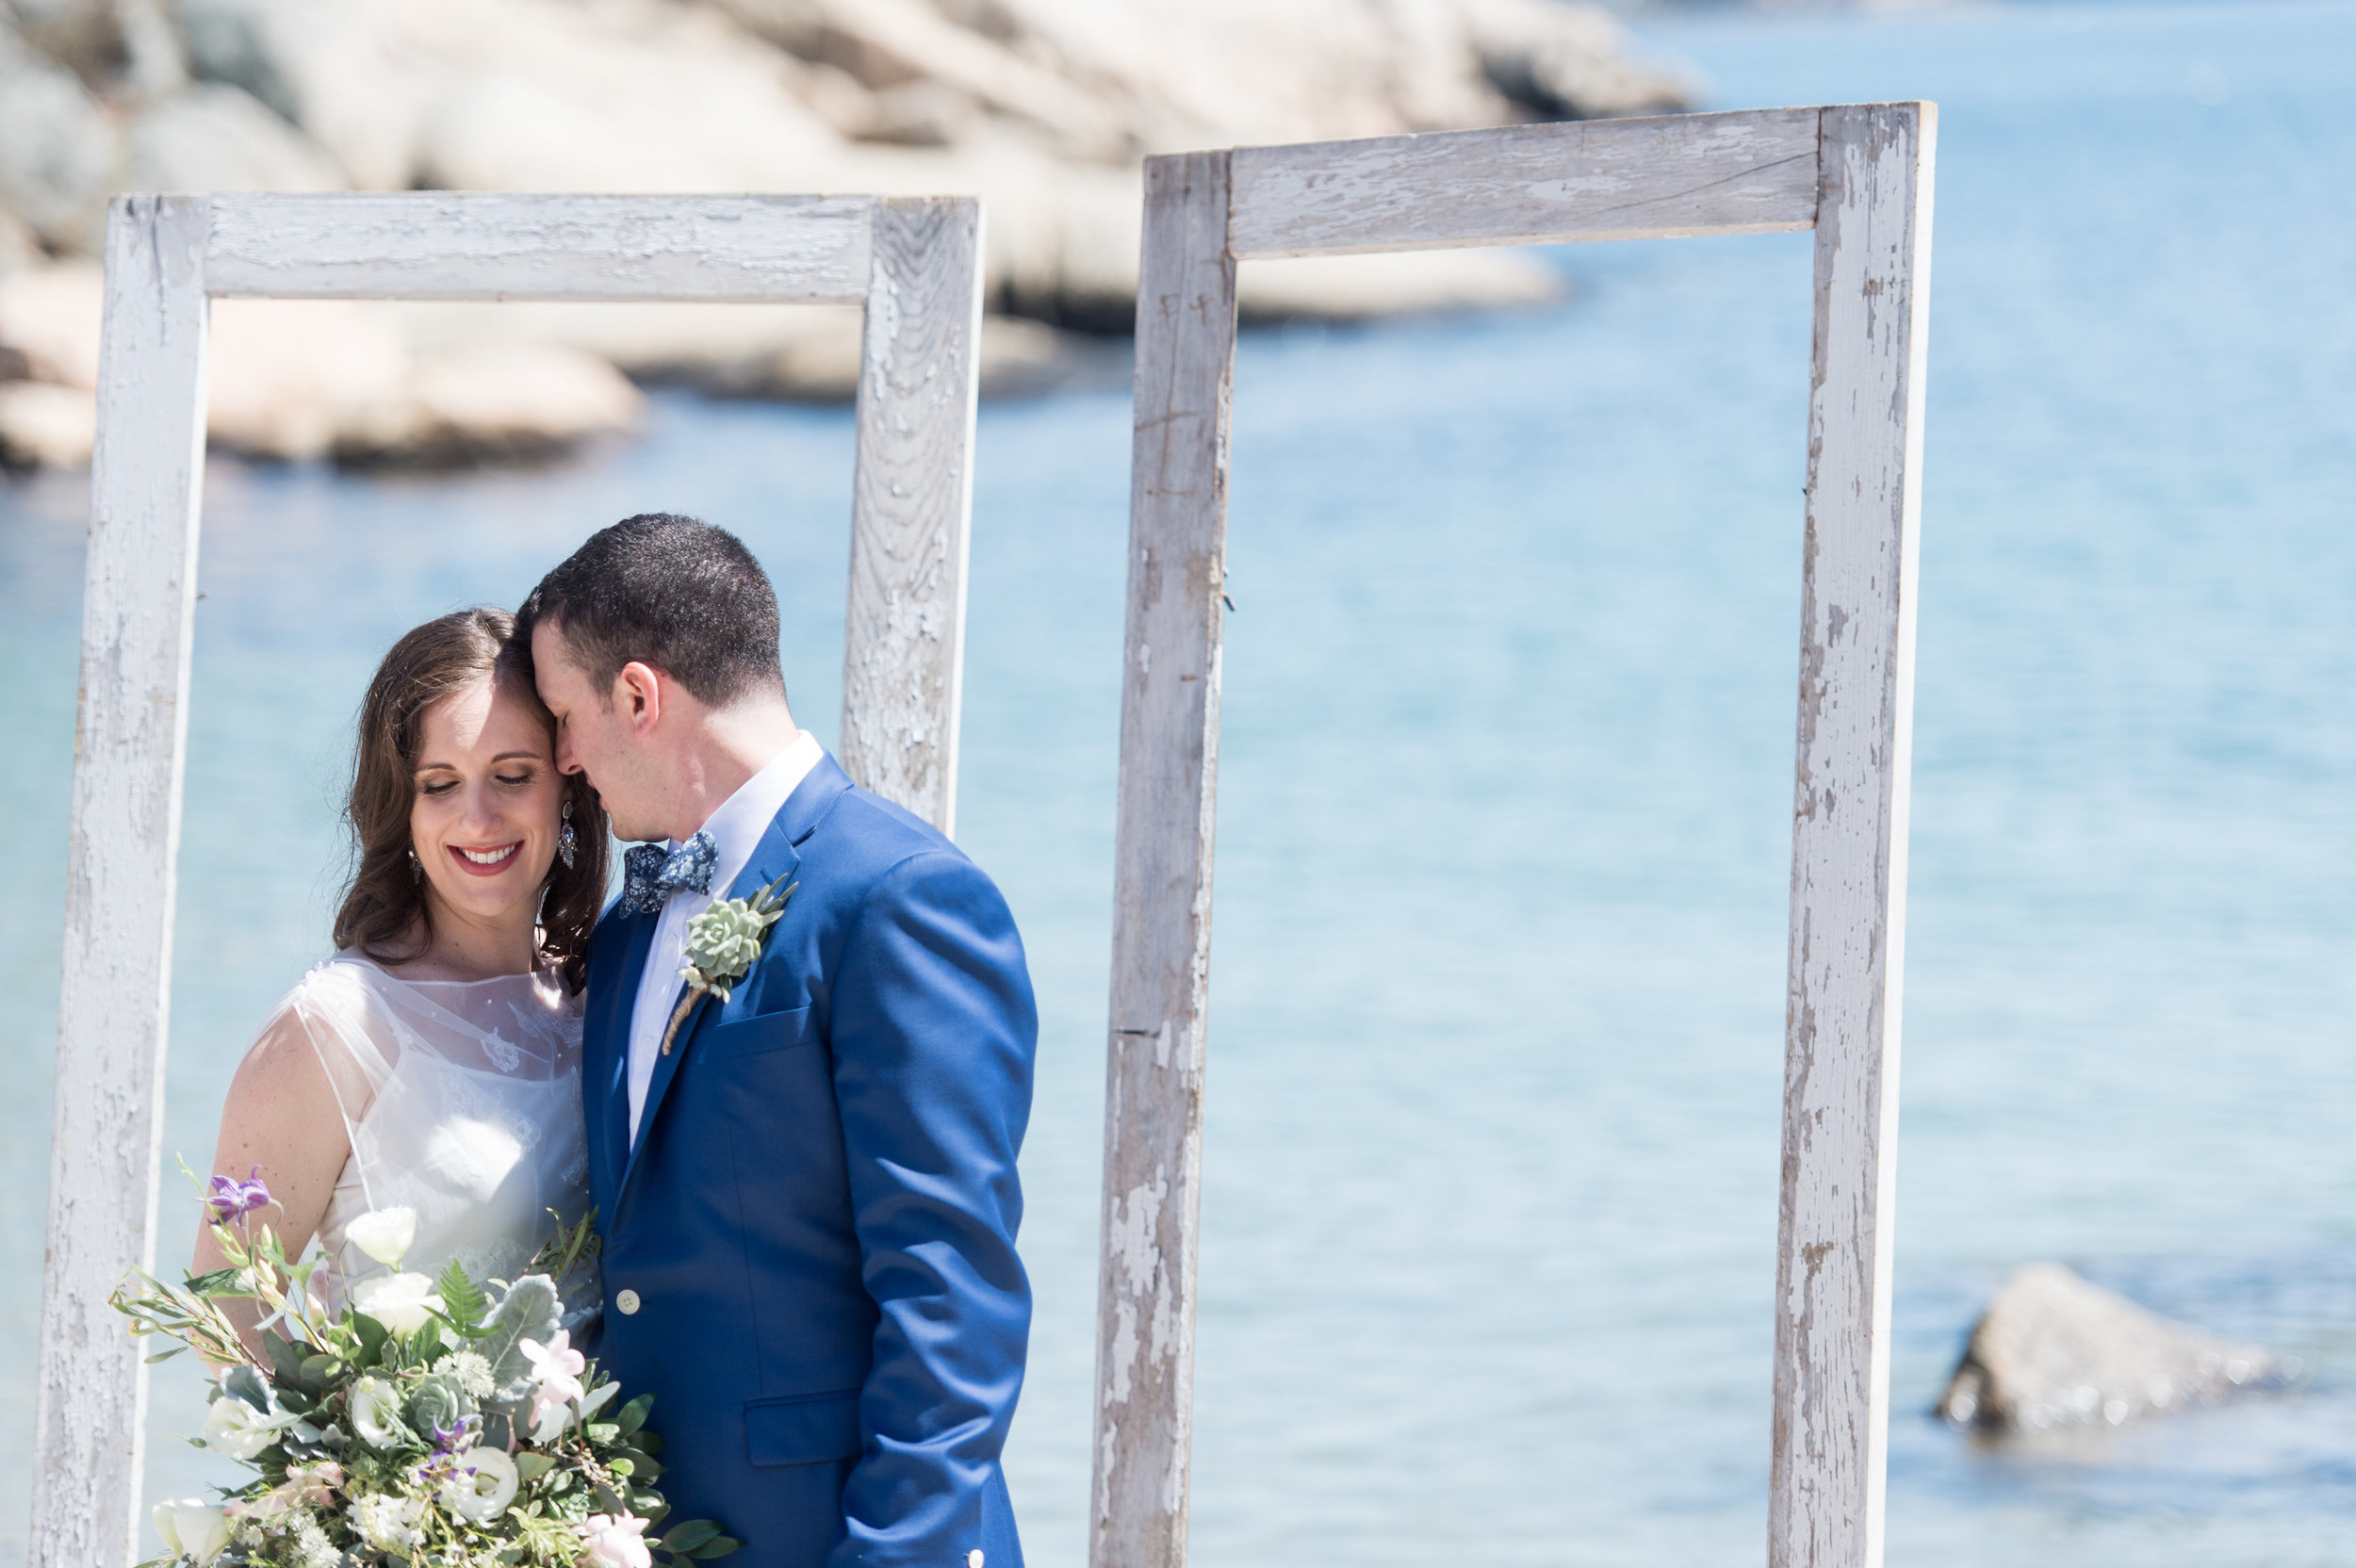 couple photography inspiration beach summer wedding outdoor photography